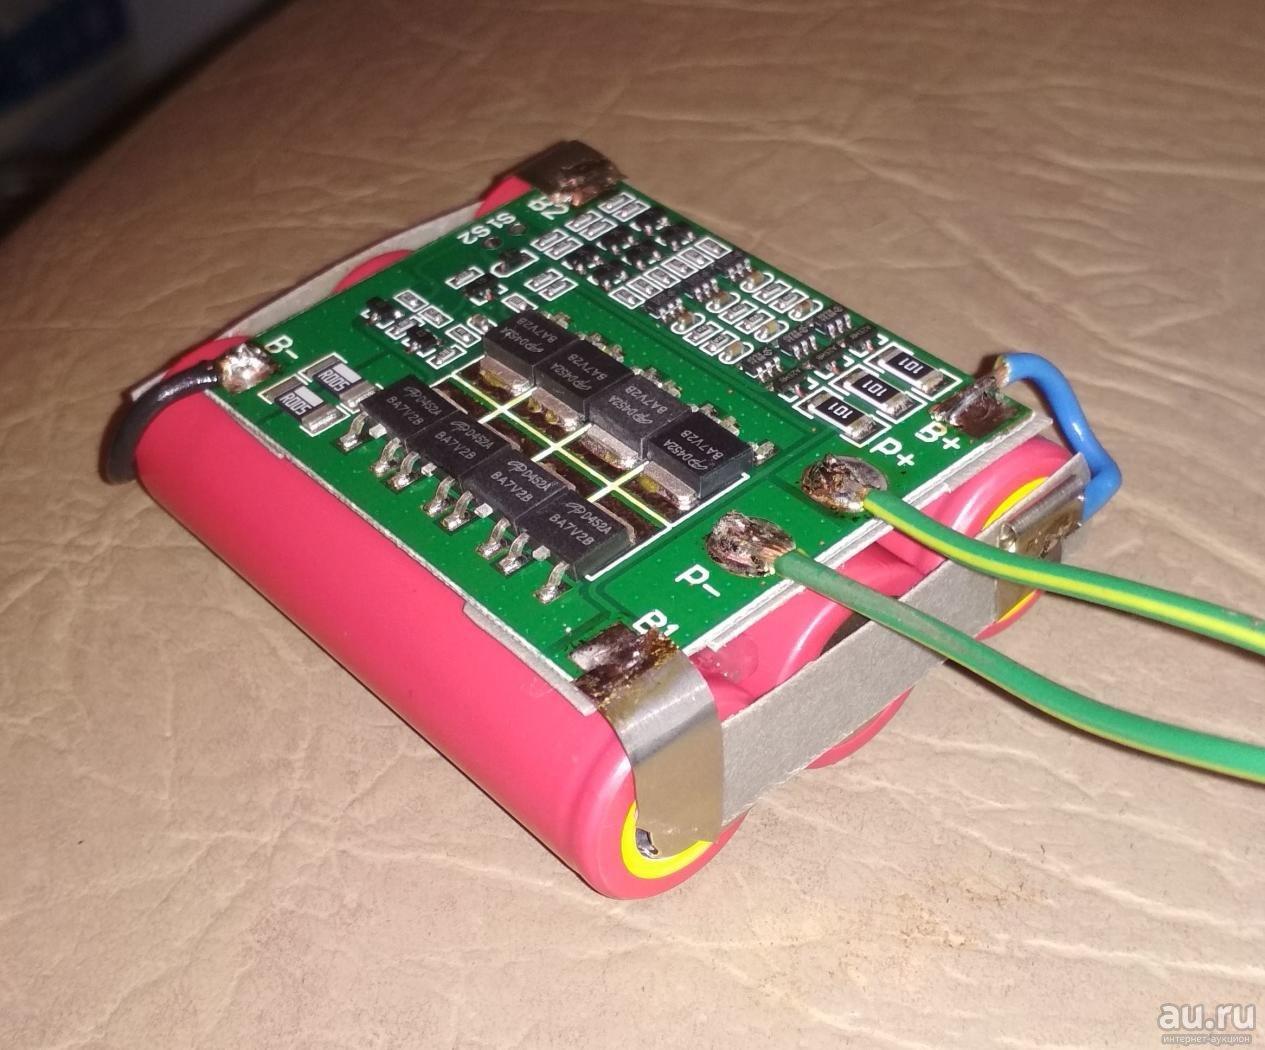 Переделка шуруповерта на литиевые аккумуляторы